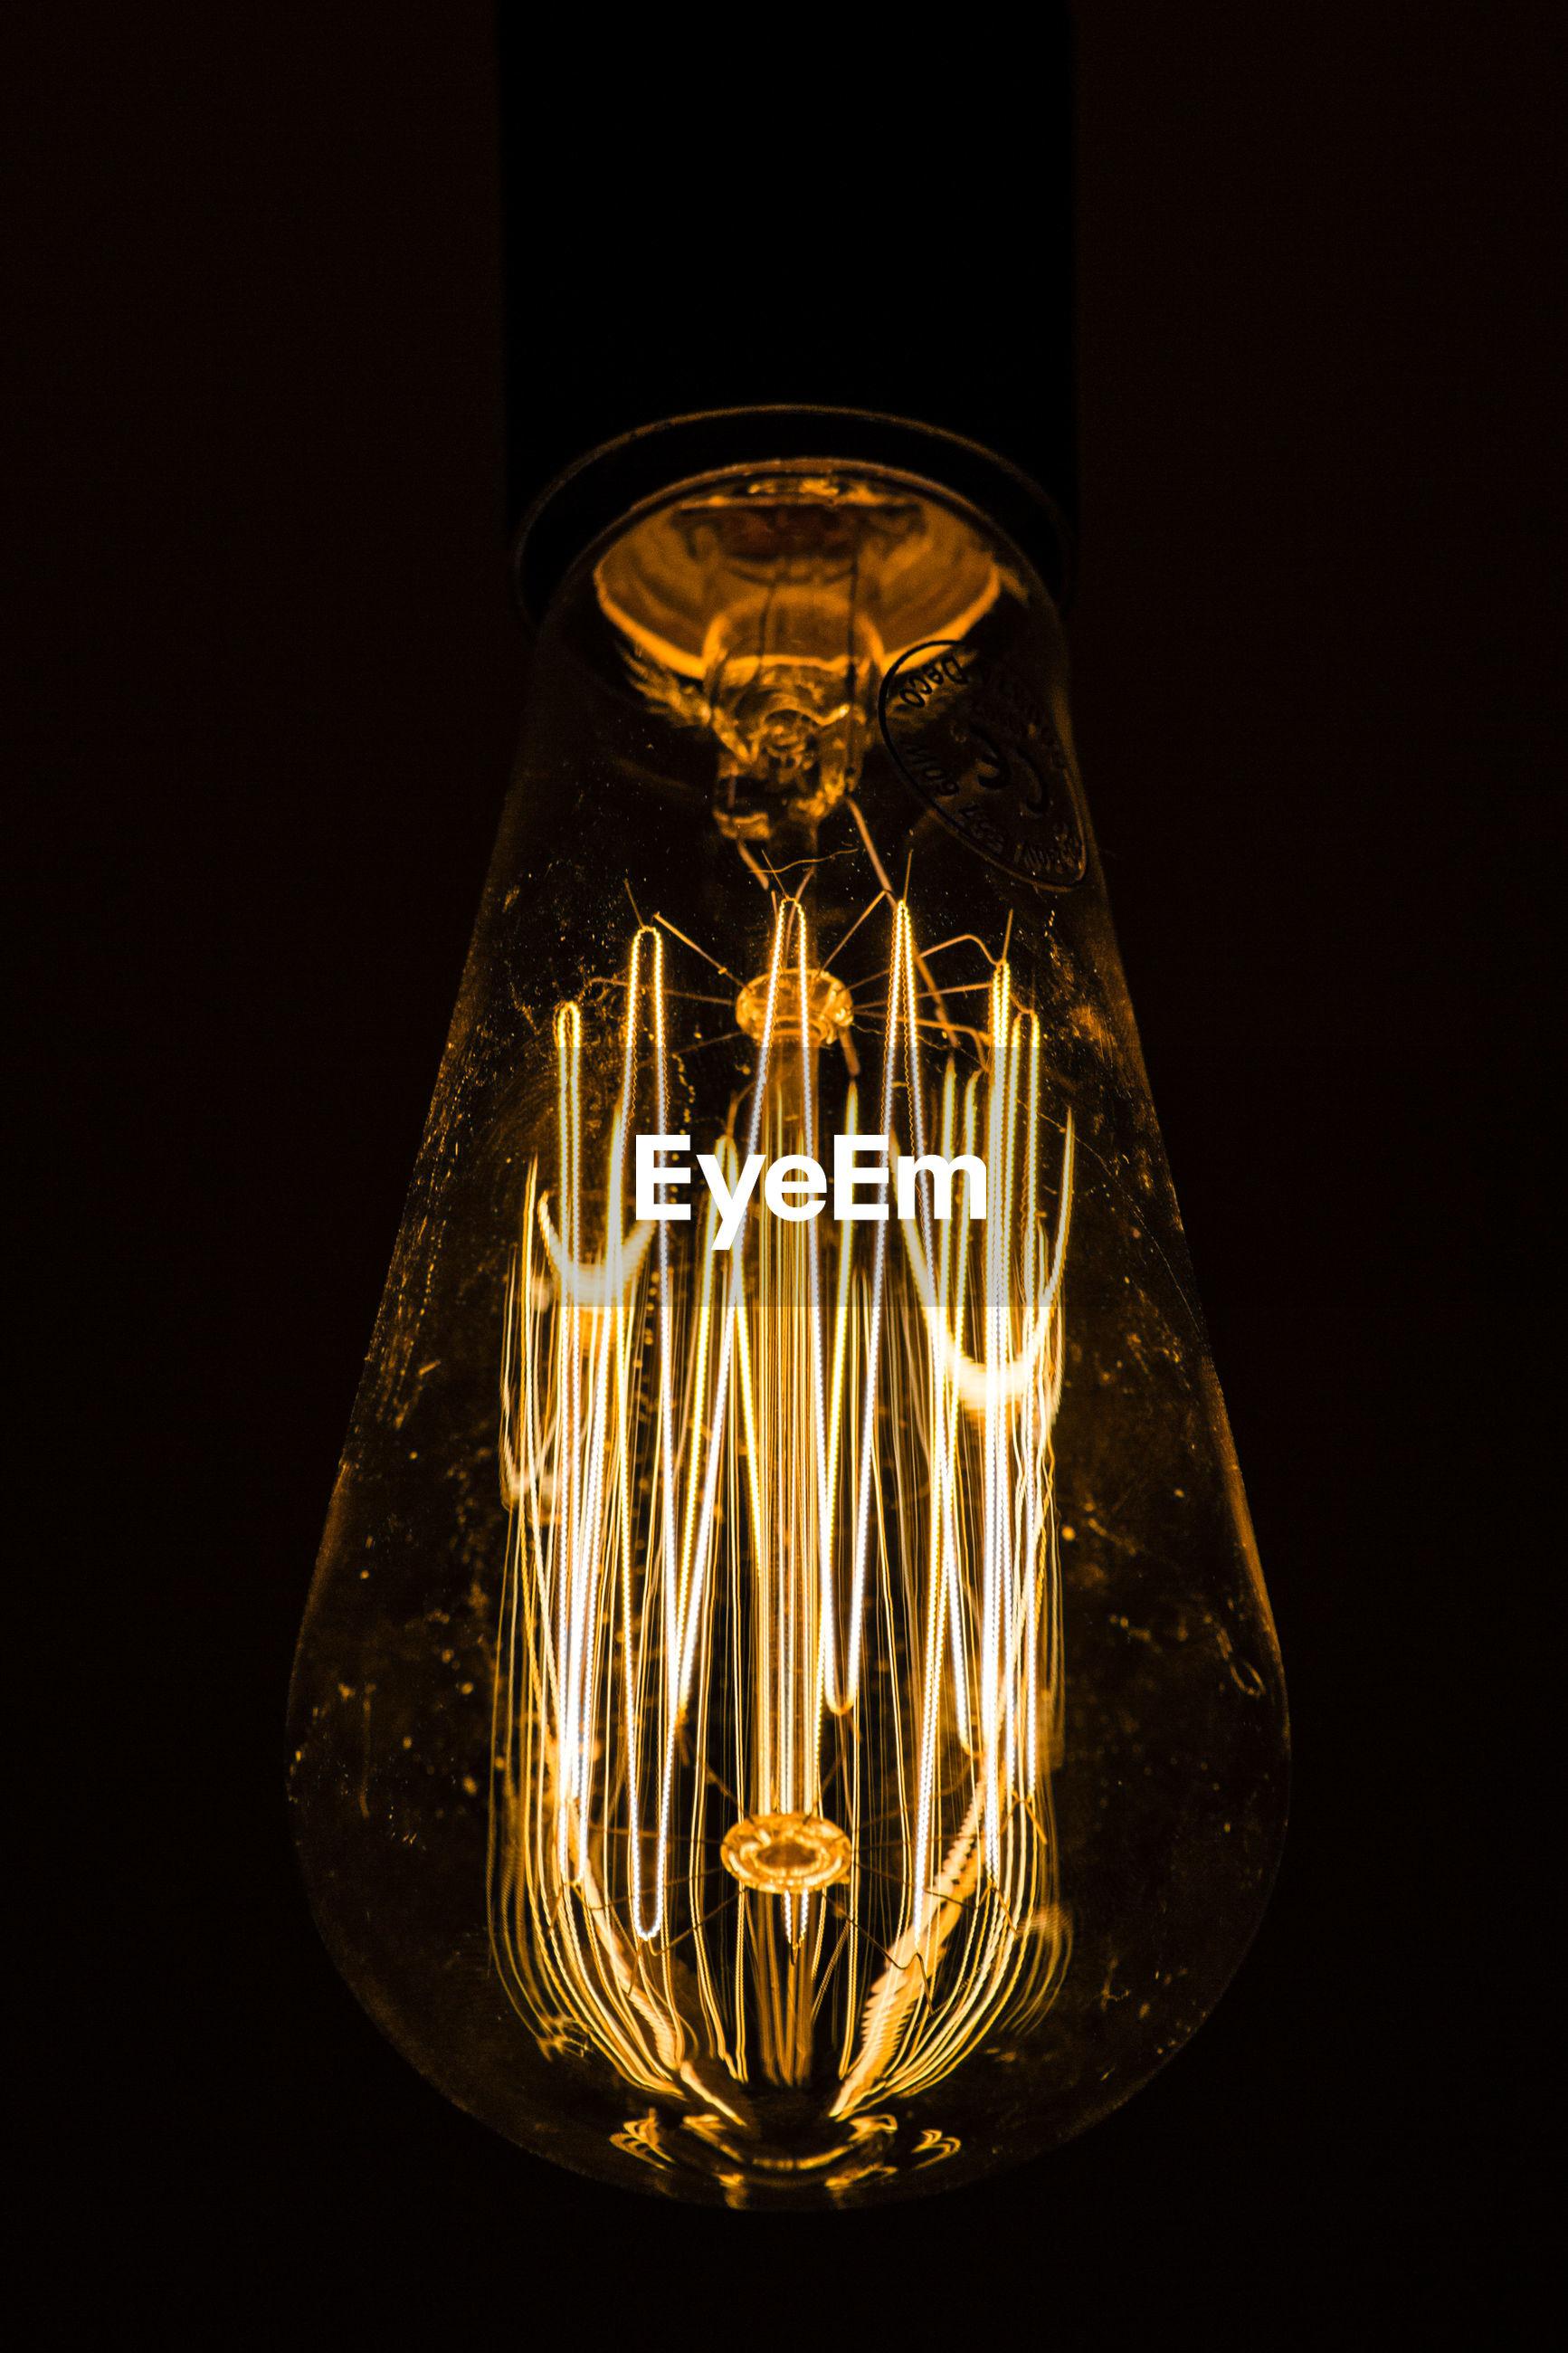 Illuminated light bulb in darkroom